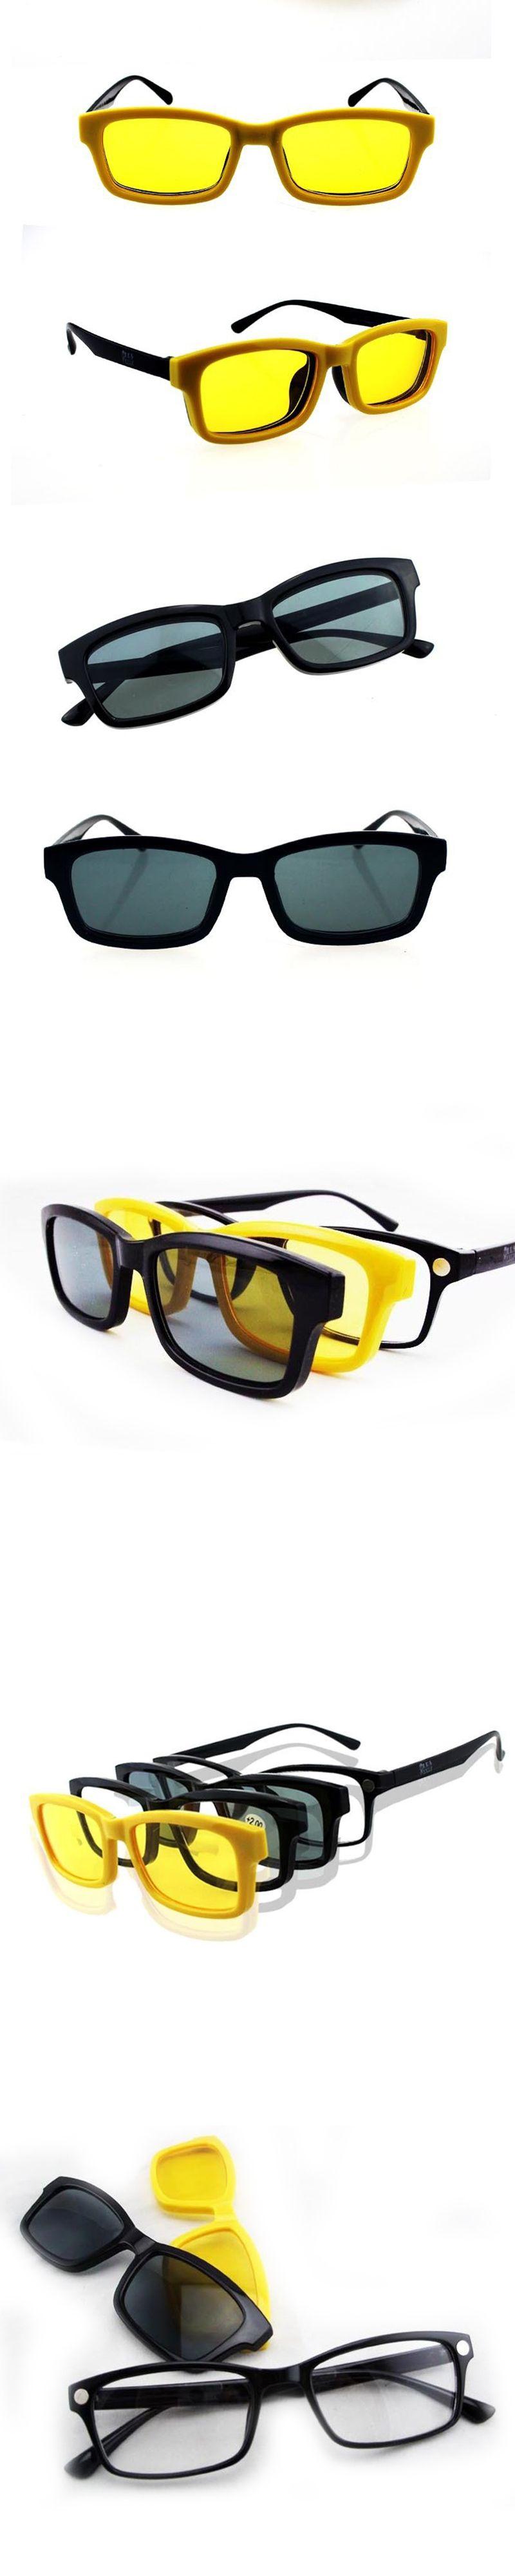 8e7b8c9b4a NEW Women 4 in 1 Magnetic Myopia Reading Glasses frame Men Clip on Sunglasses  Eyewear Free